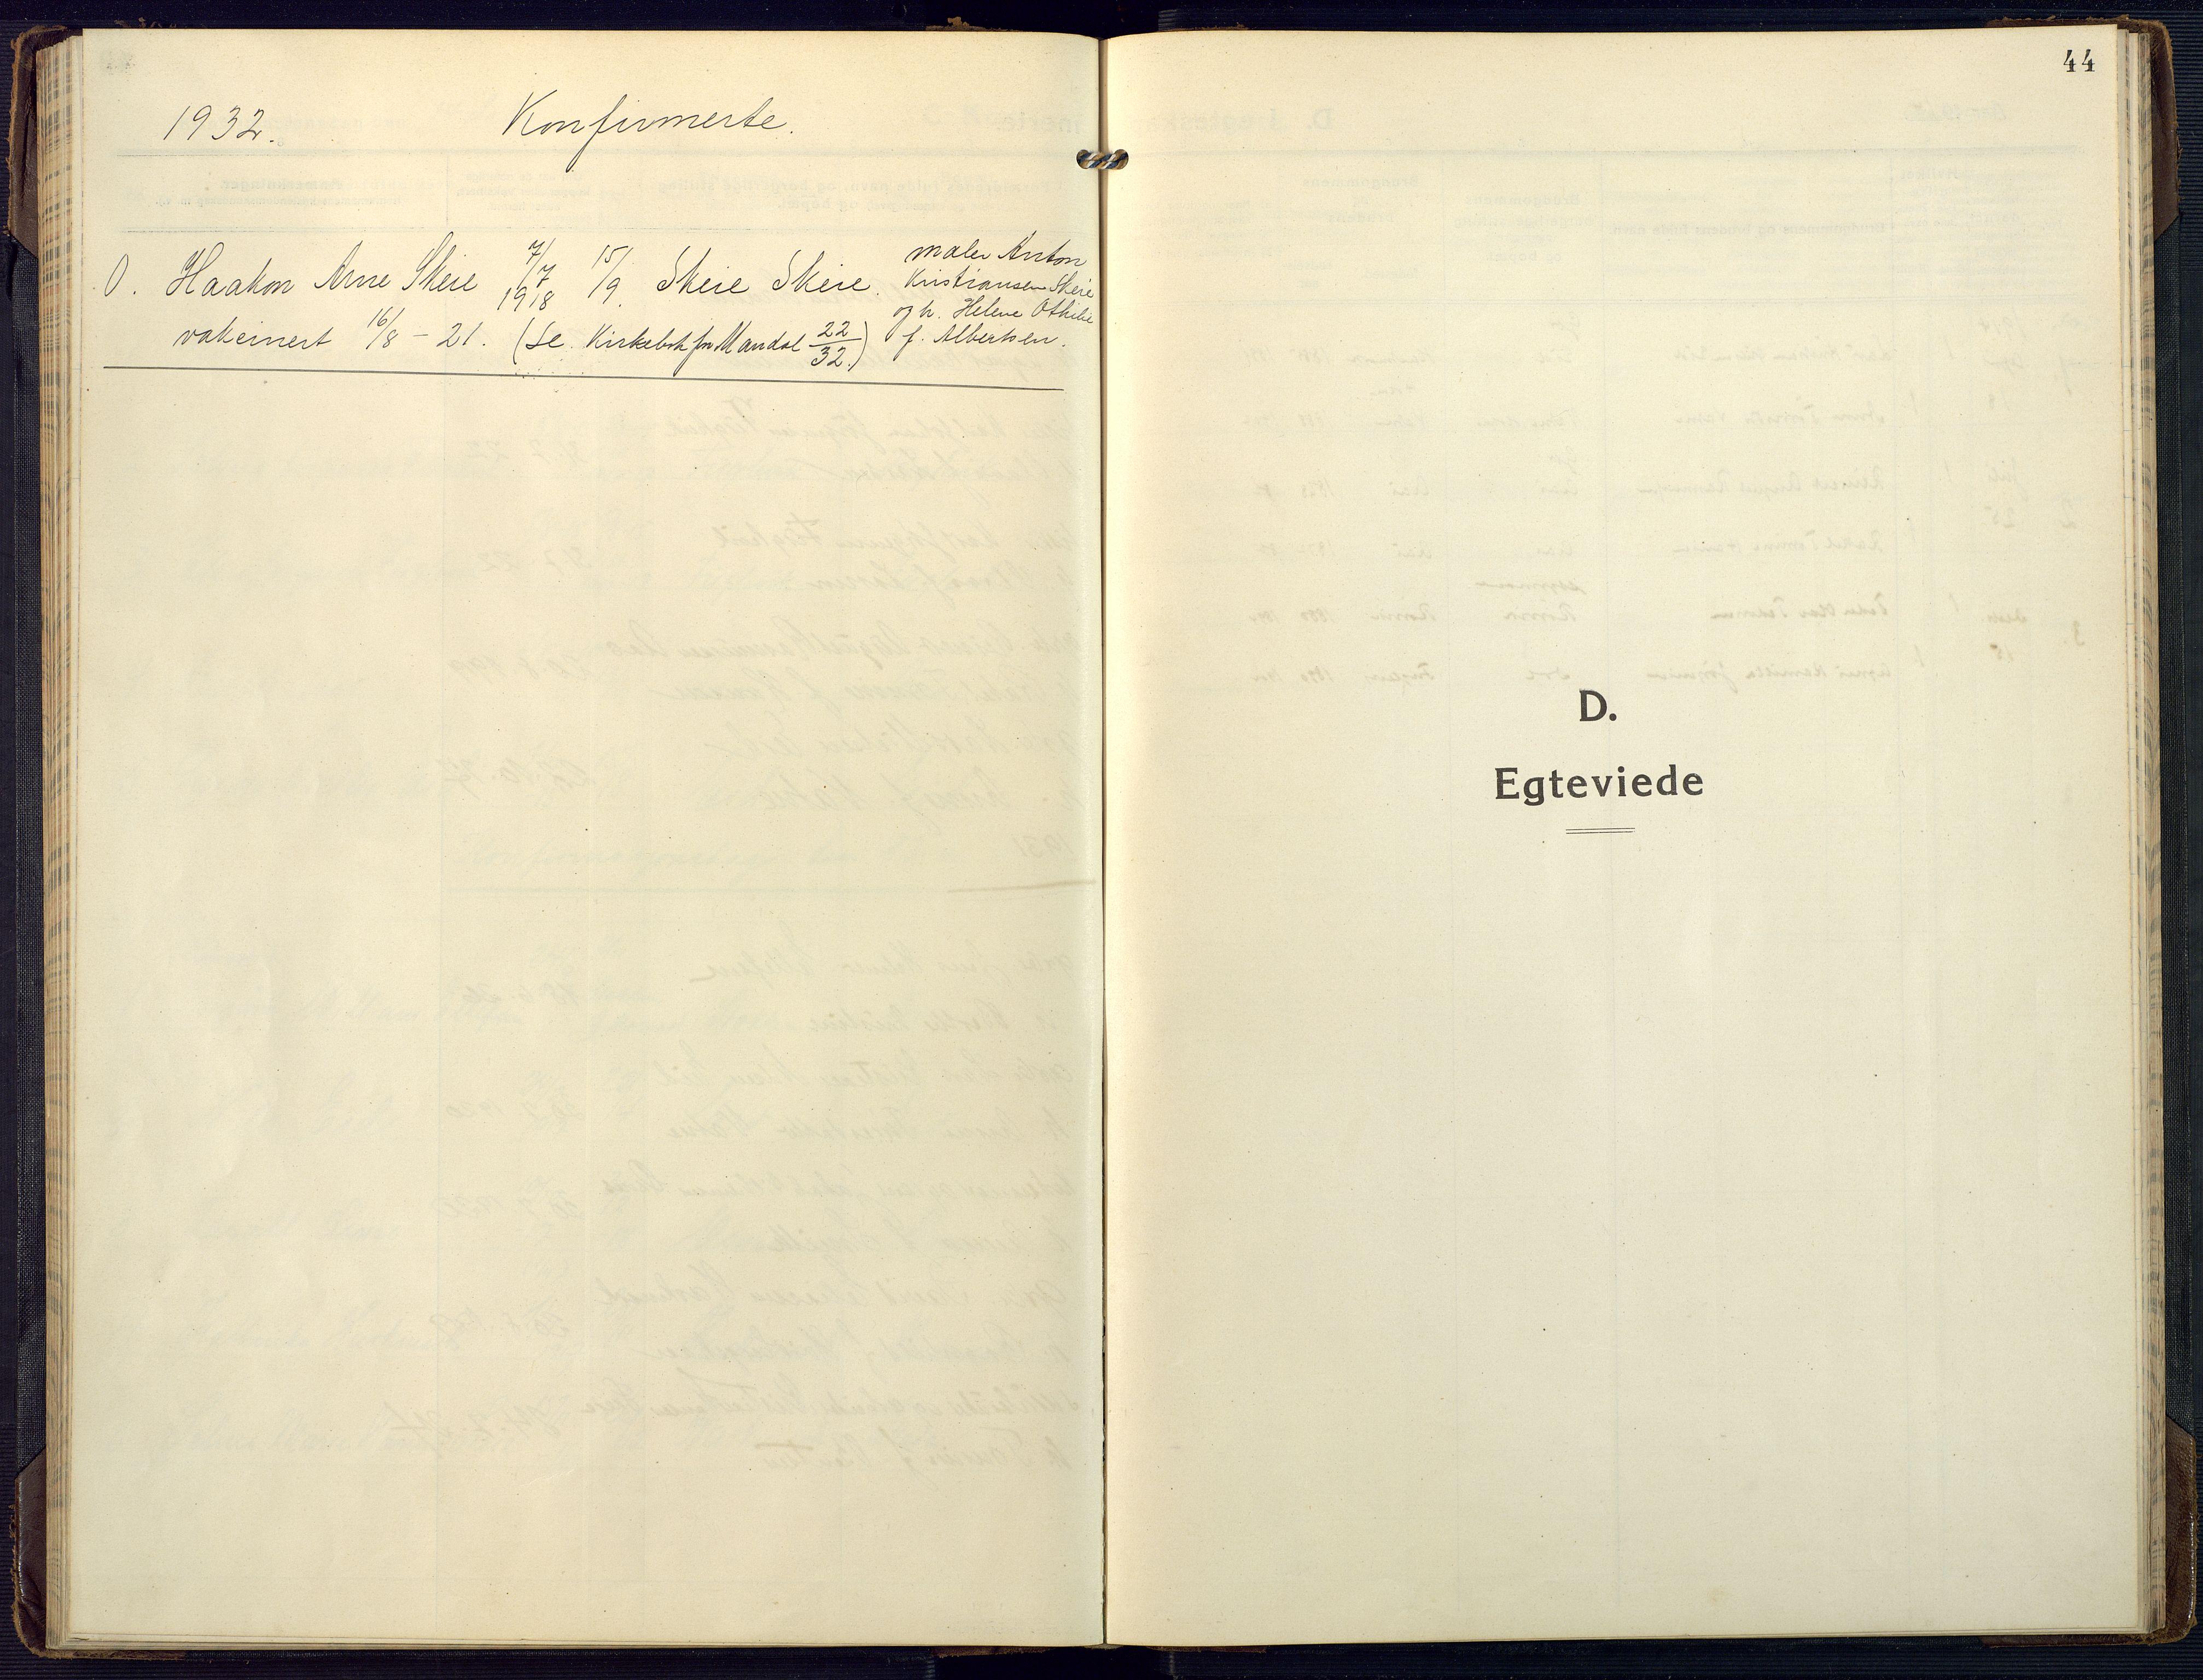 SAK, Mandal sokneprestkontor, F/Fa/Fab/L0003: Ministerialbok nr. A 3, 1913-1933, s. 44